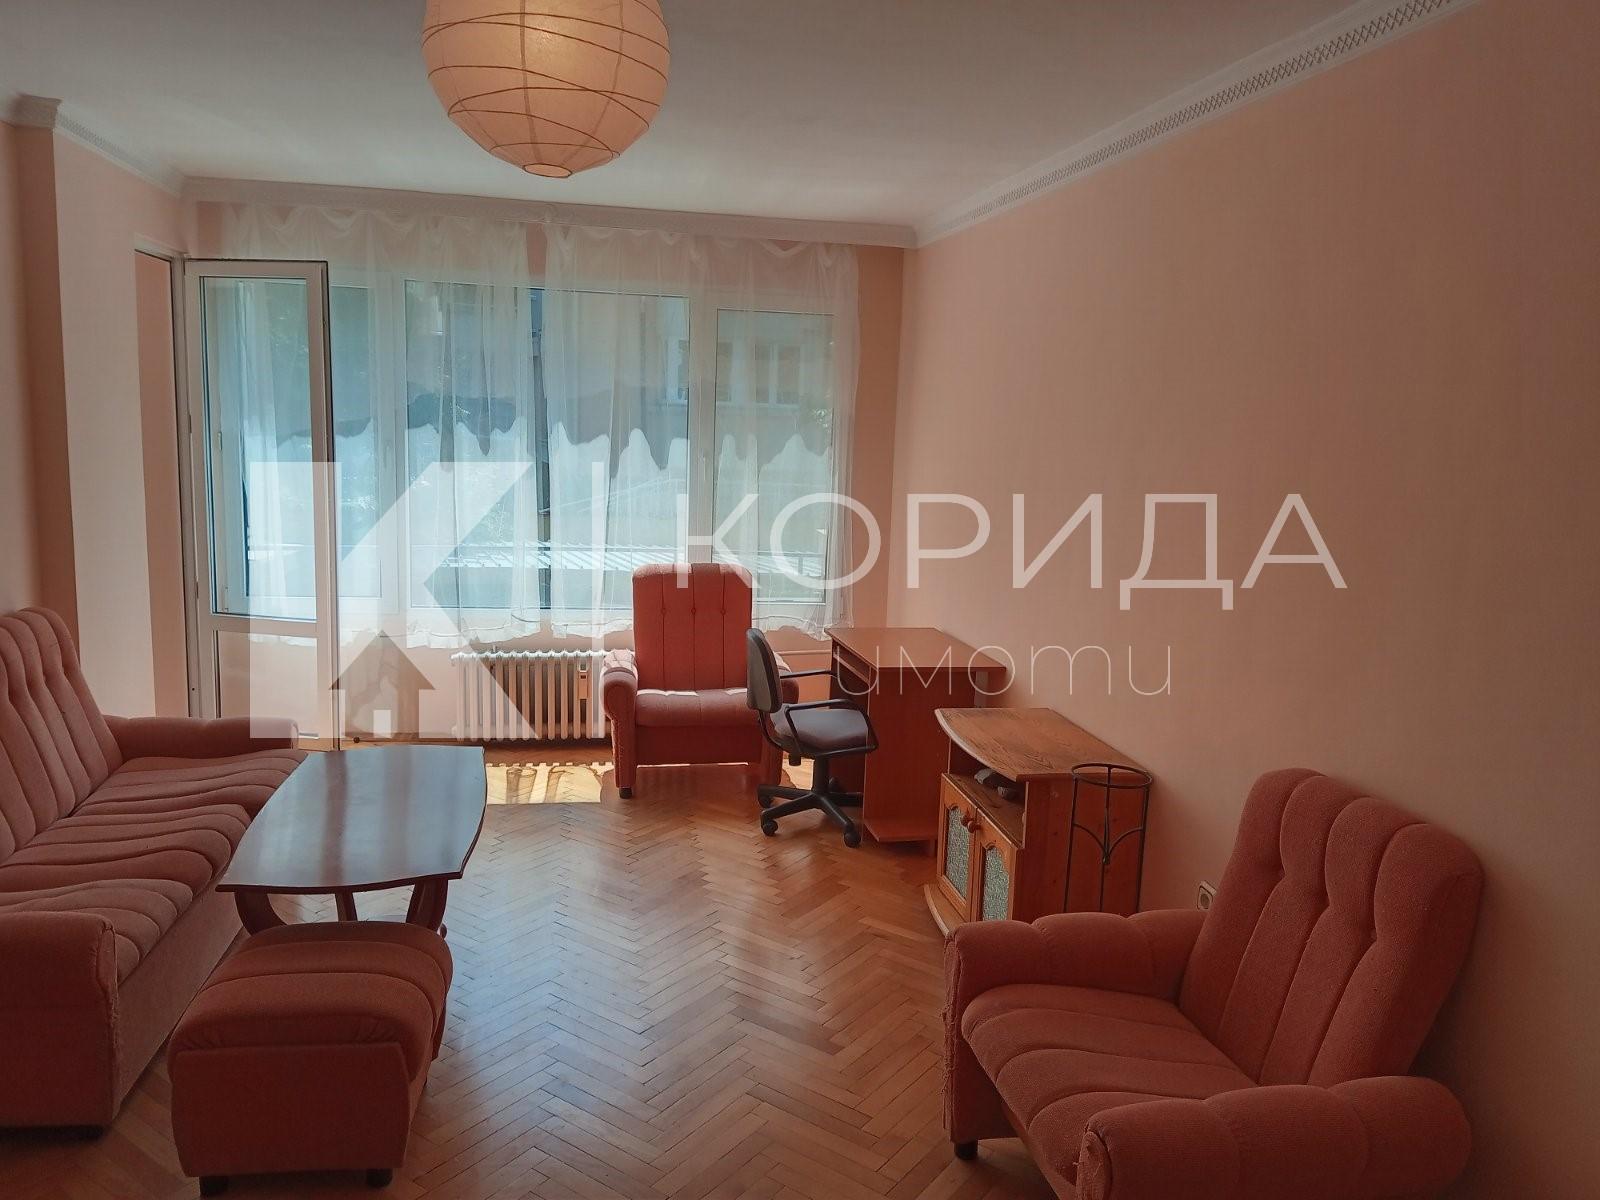 3-стаен апартамент на ул. Крум Попов